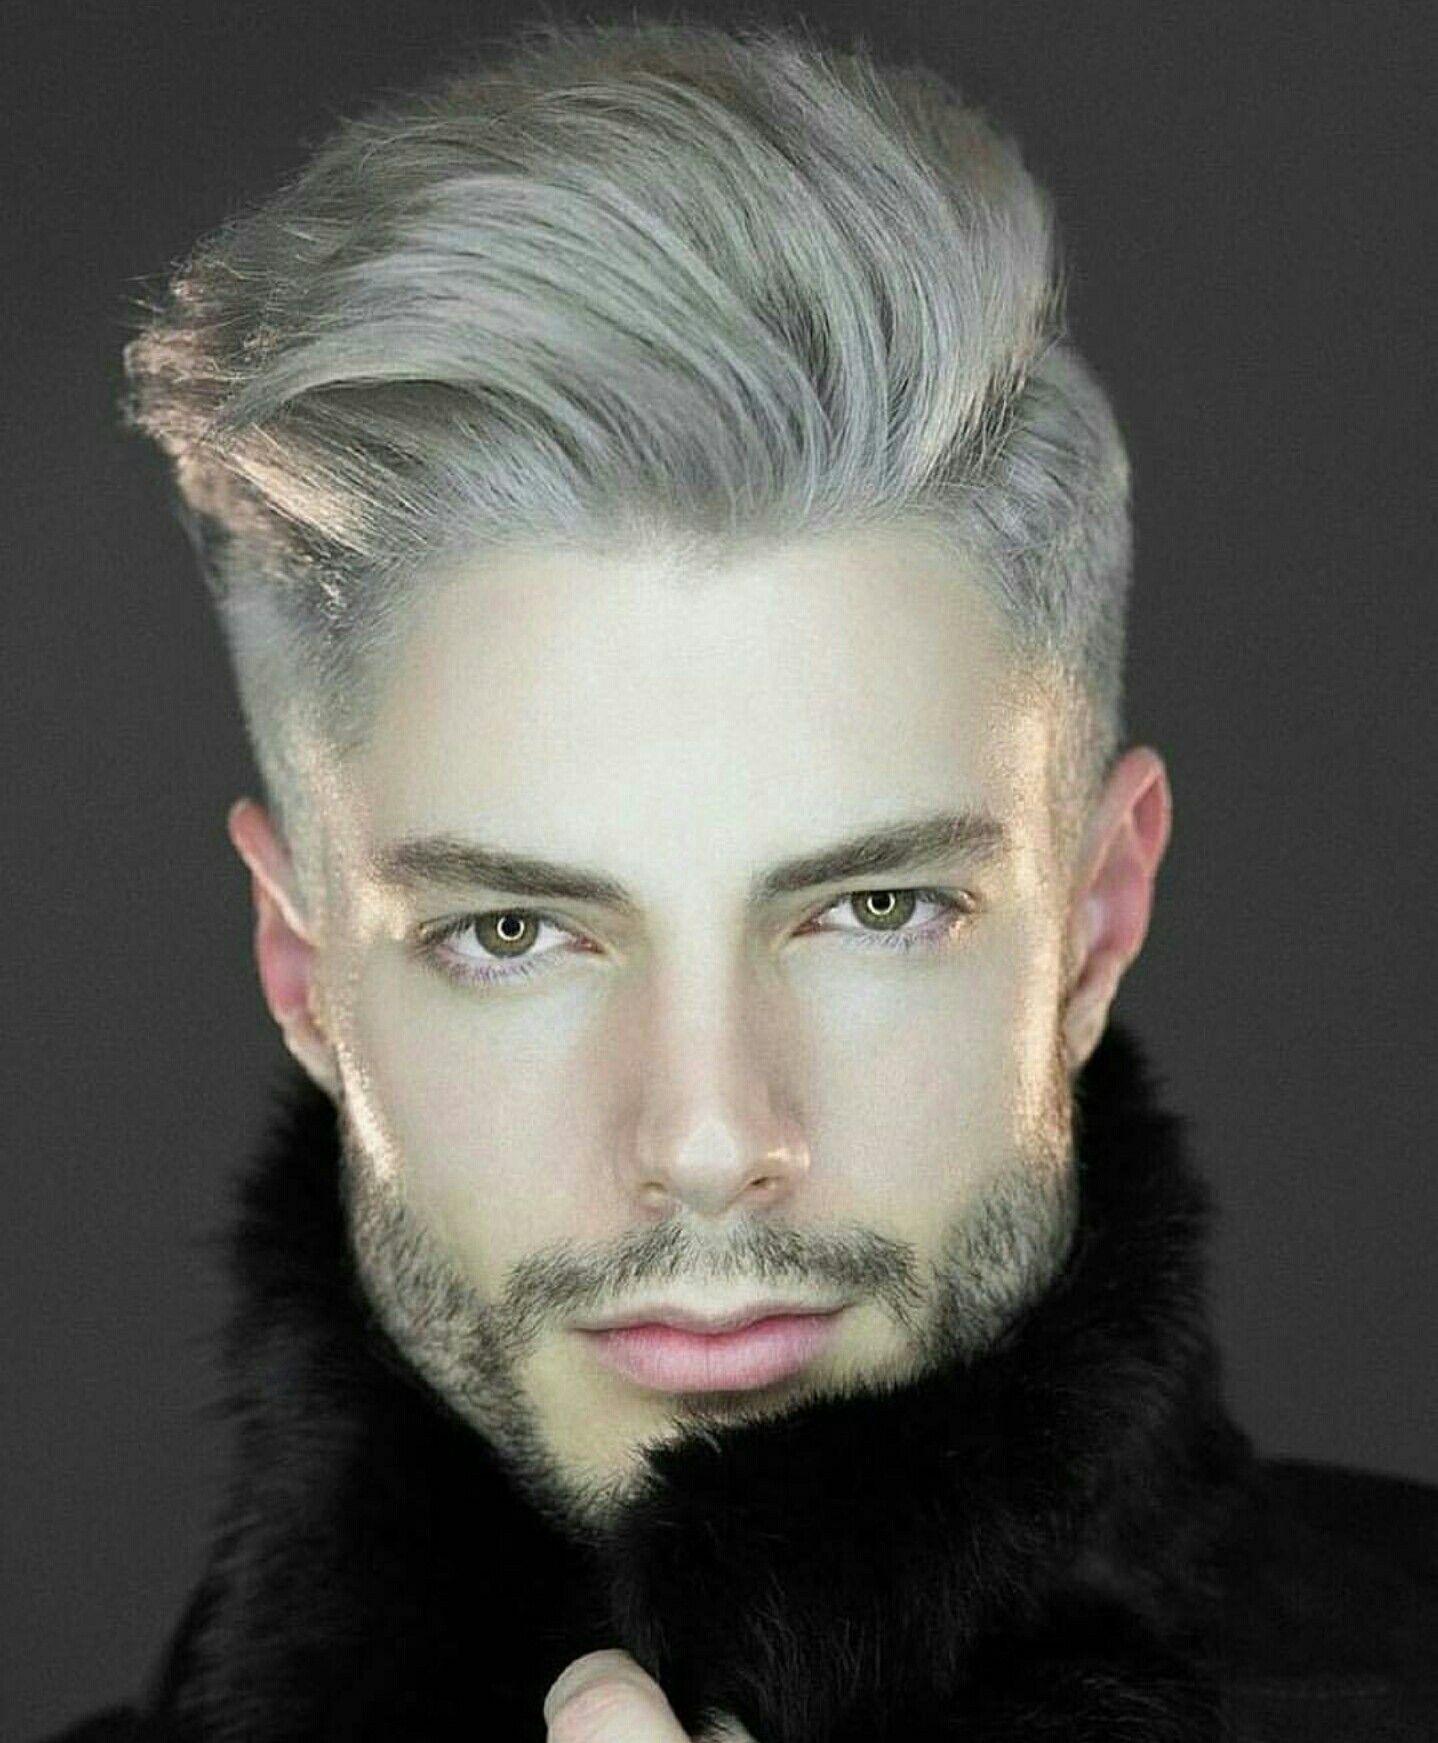 undercut frisuren herren blond - undercut frisuren männer